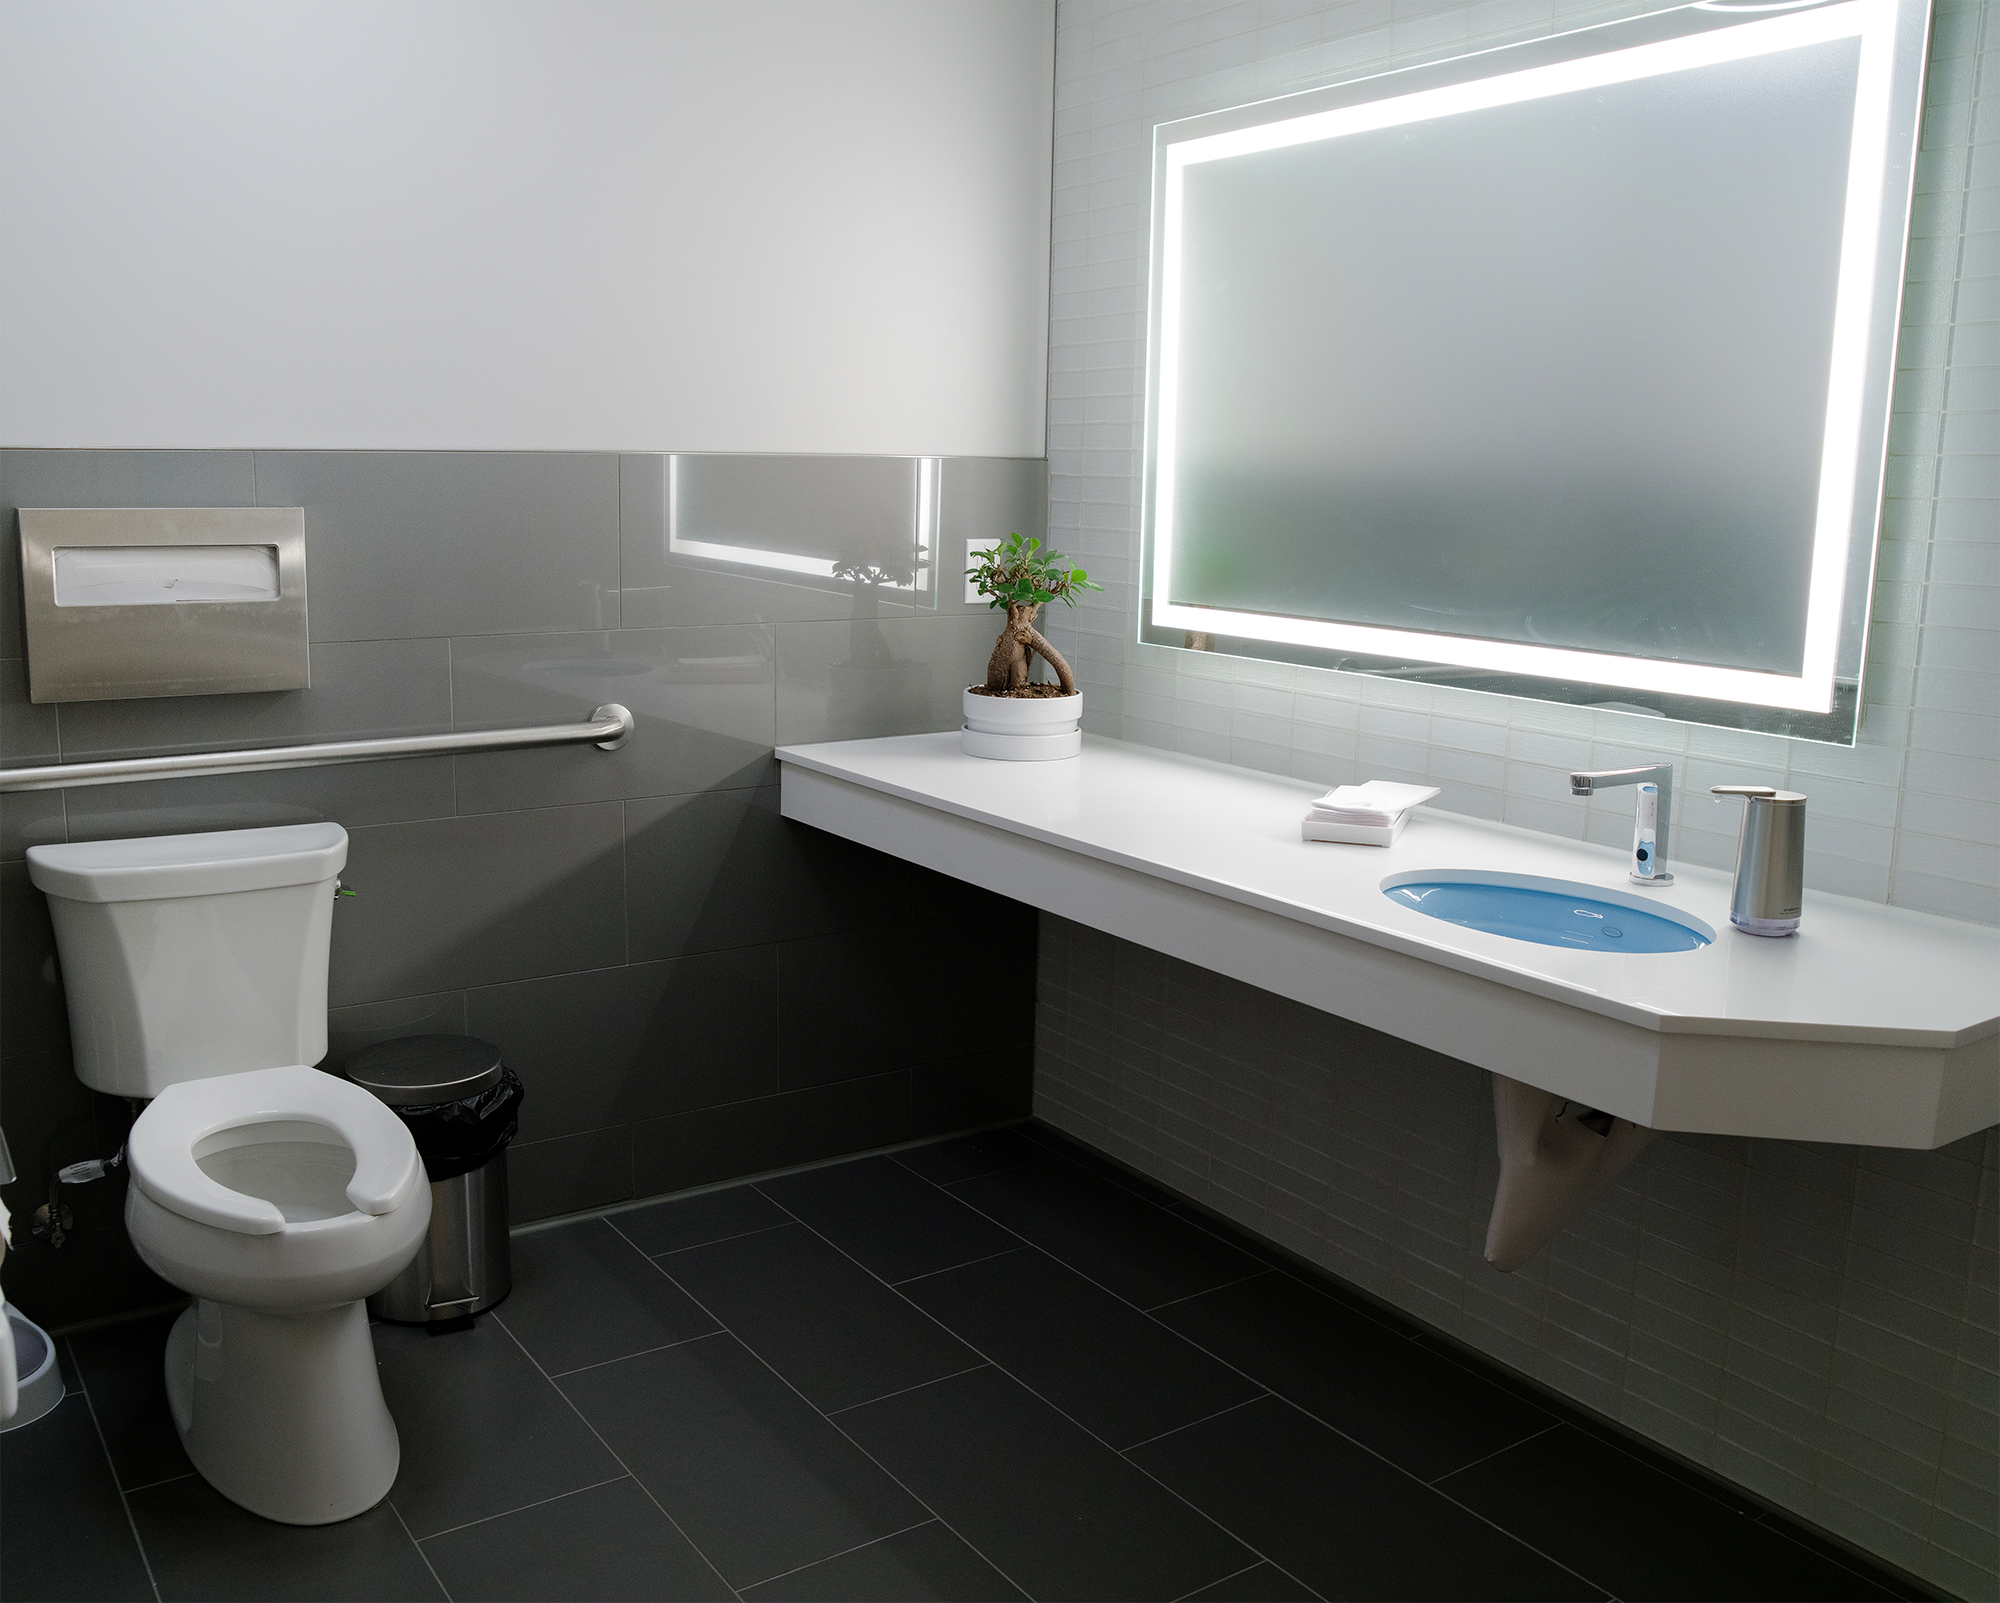 Private patient washroom